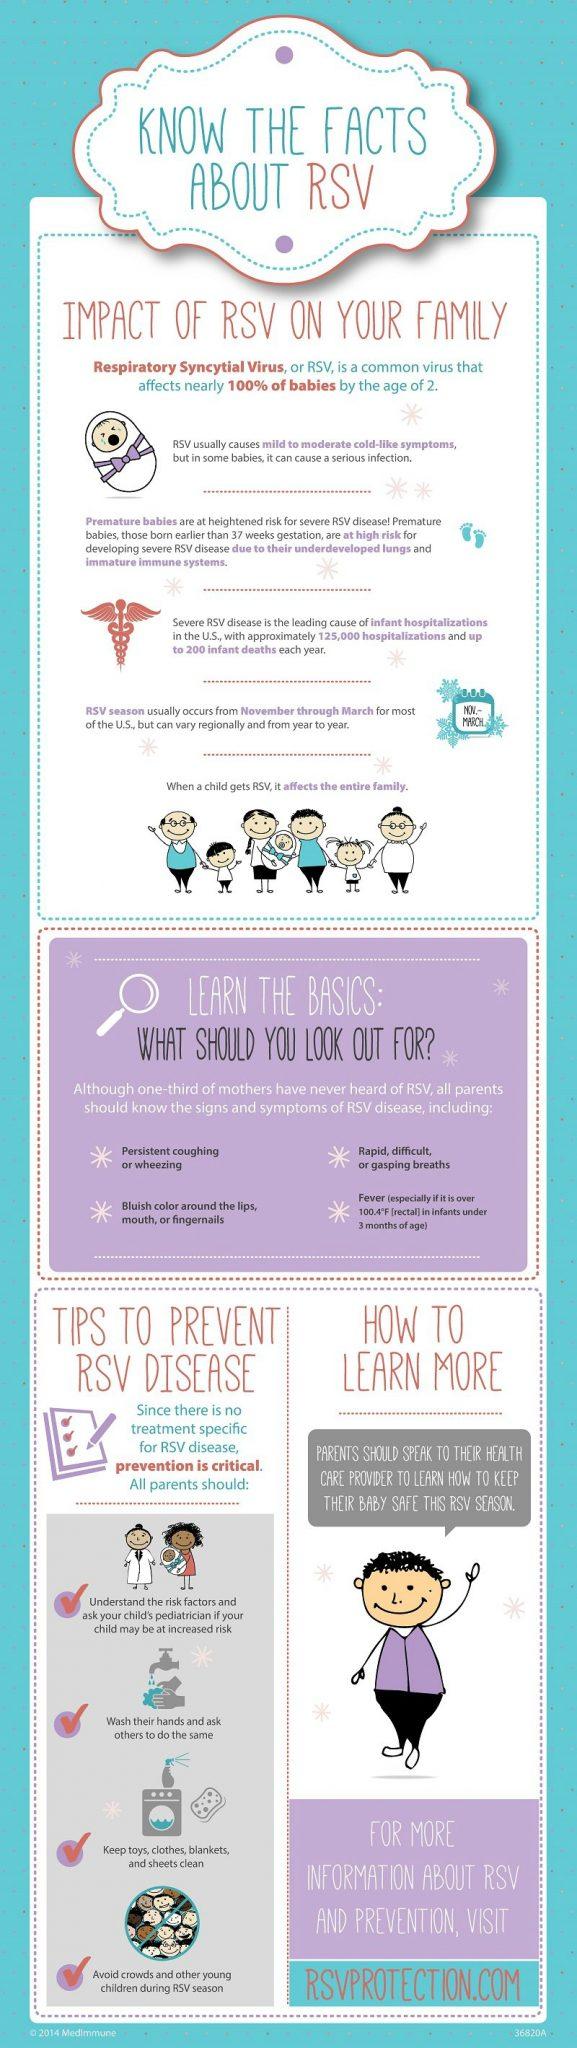 RSV Infographic - OnceAMomAlwaysAMom.com